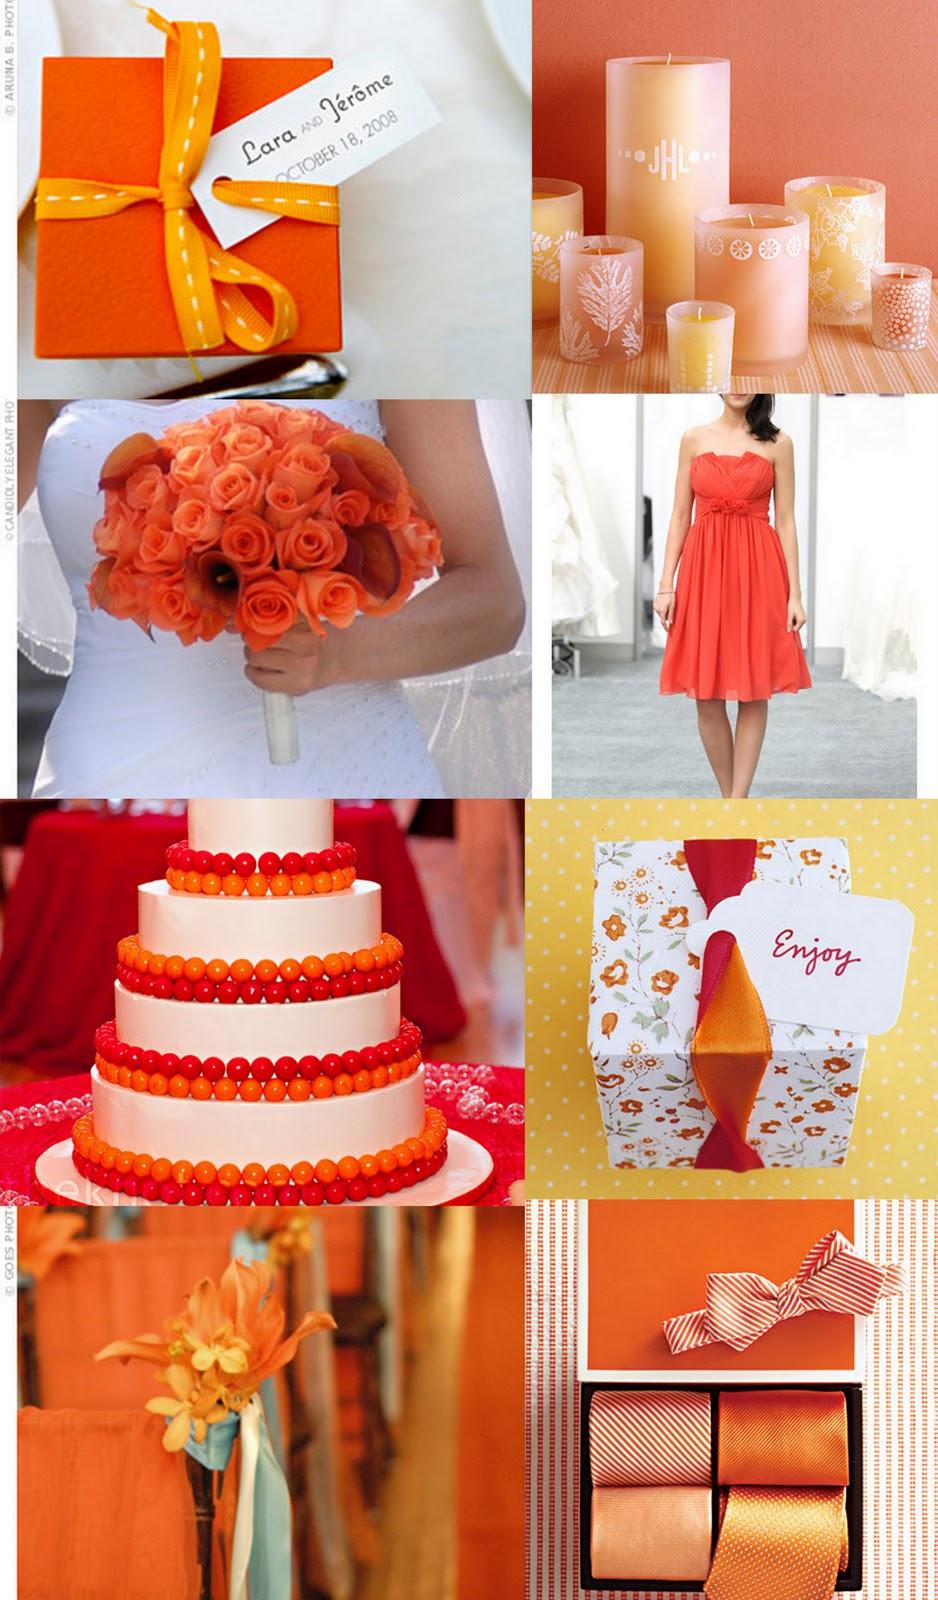 COLOR COMBO - ORANGE, PINK, FUCHSIA, RED, PURPLE, WHITE on ... Tangerine Tango Wedding